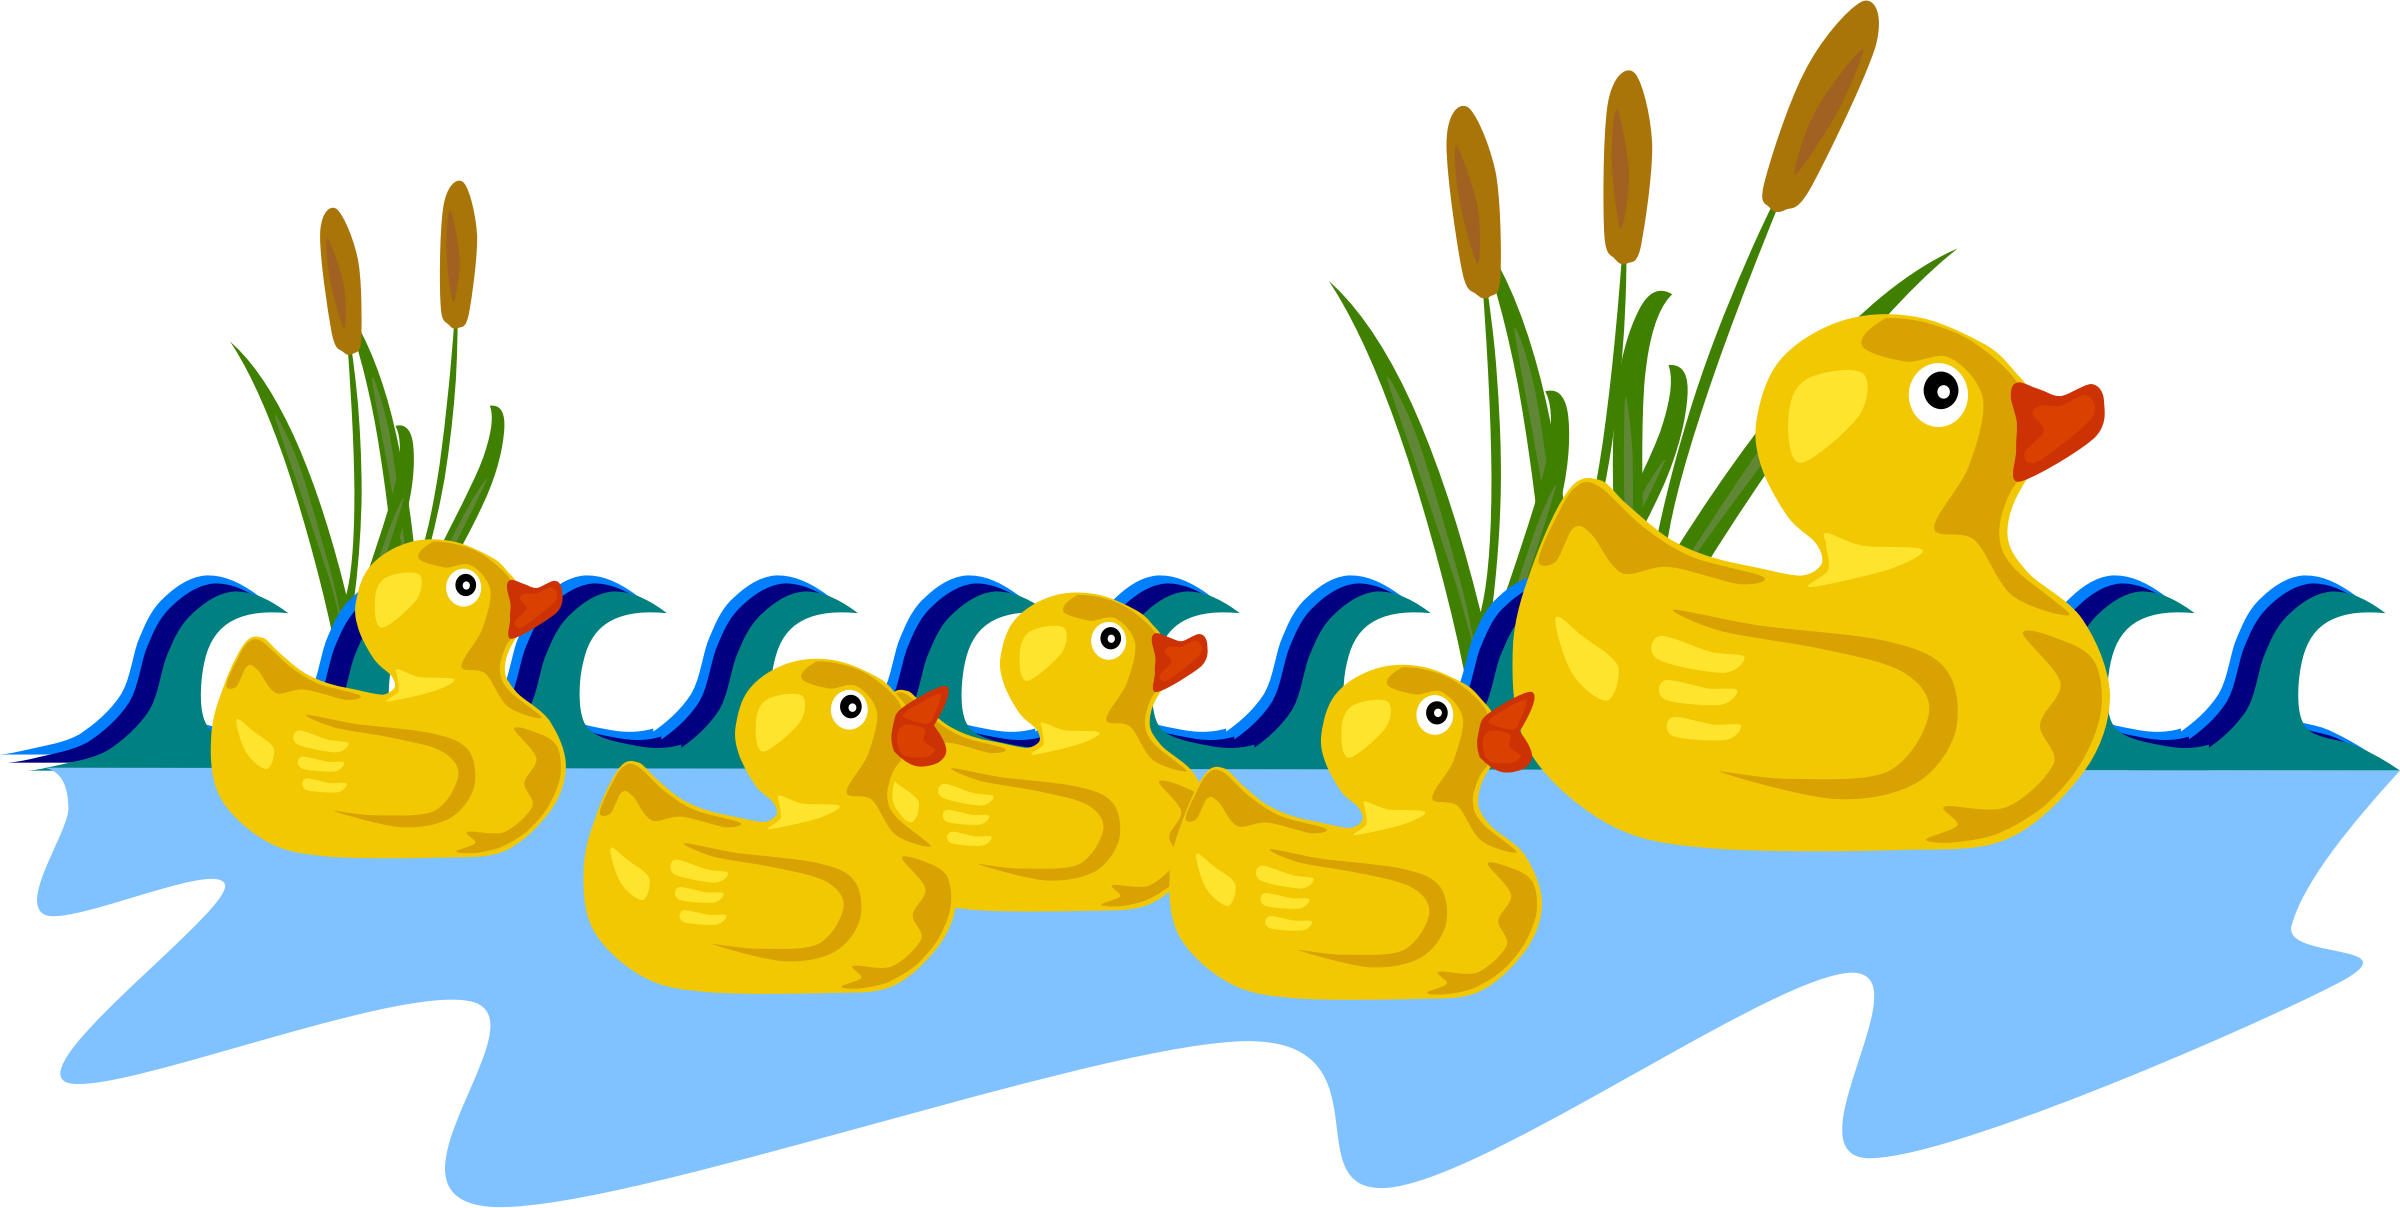 Ducks clipart animated. Duckling bath duck pencil